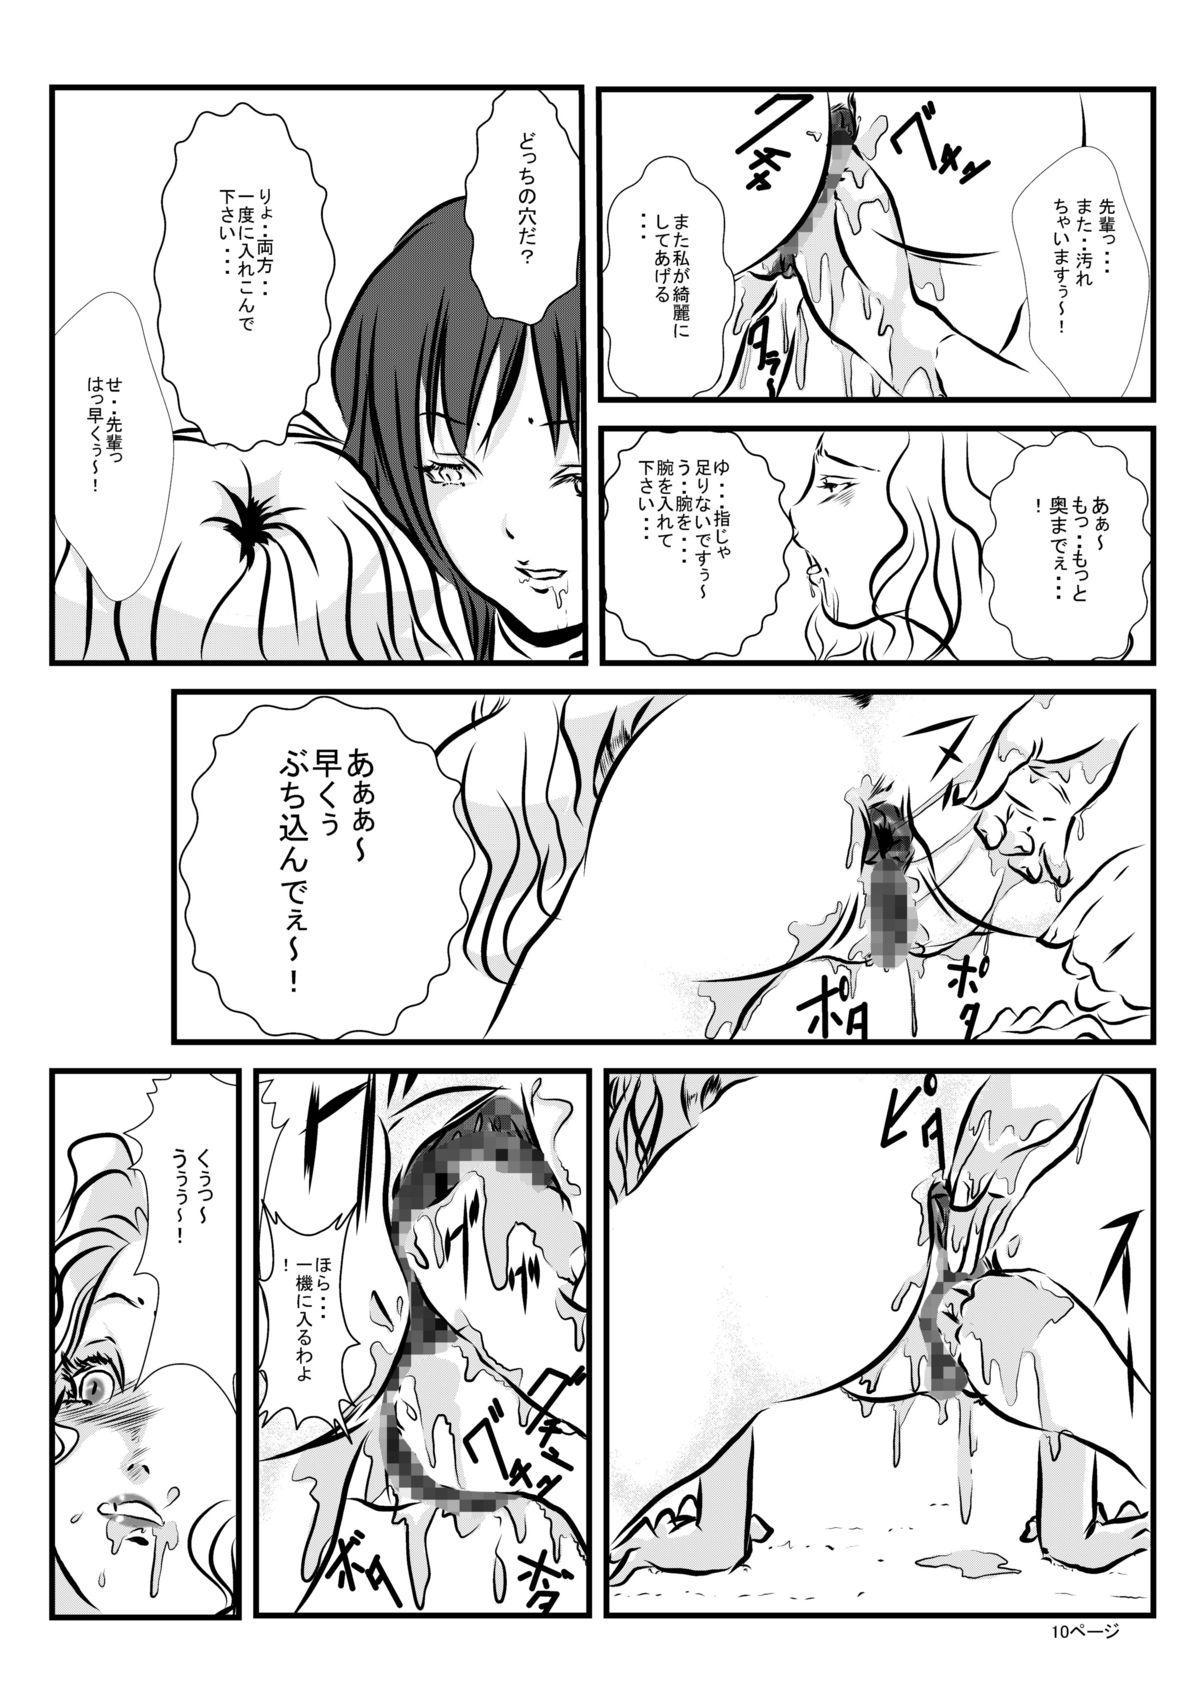 Loli Type no Jikkensitsu 8